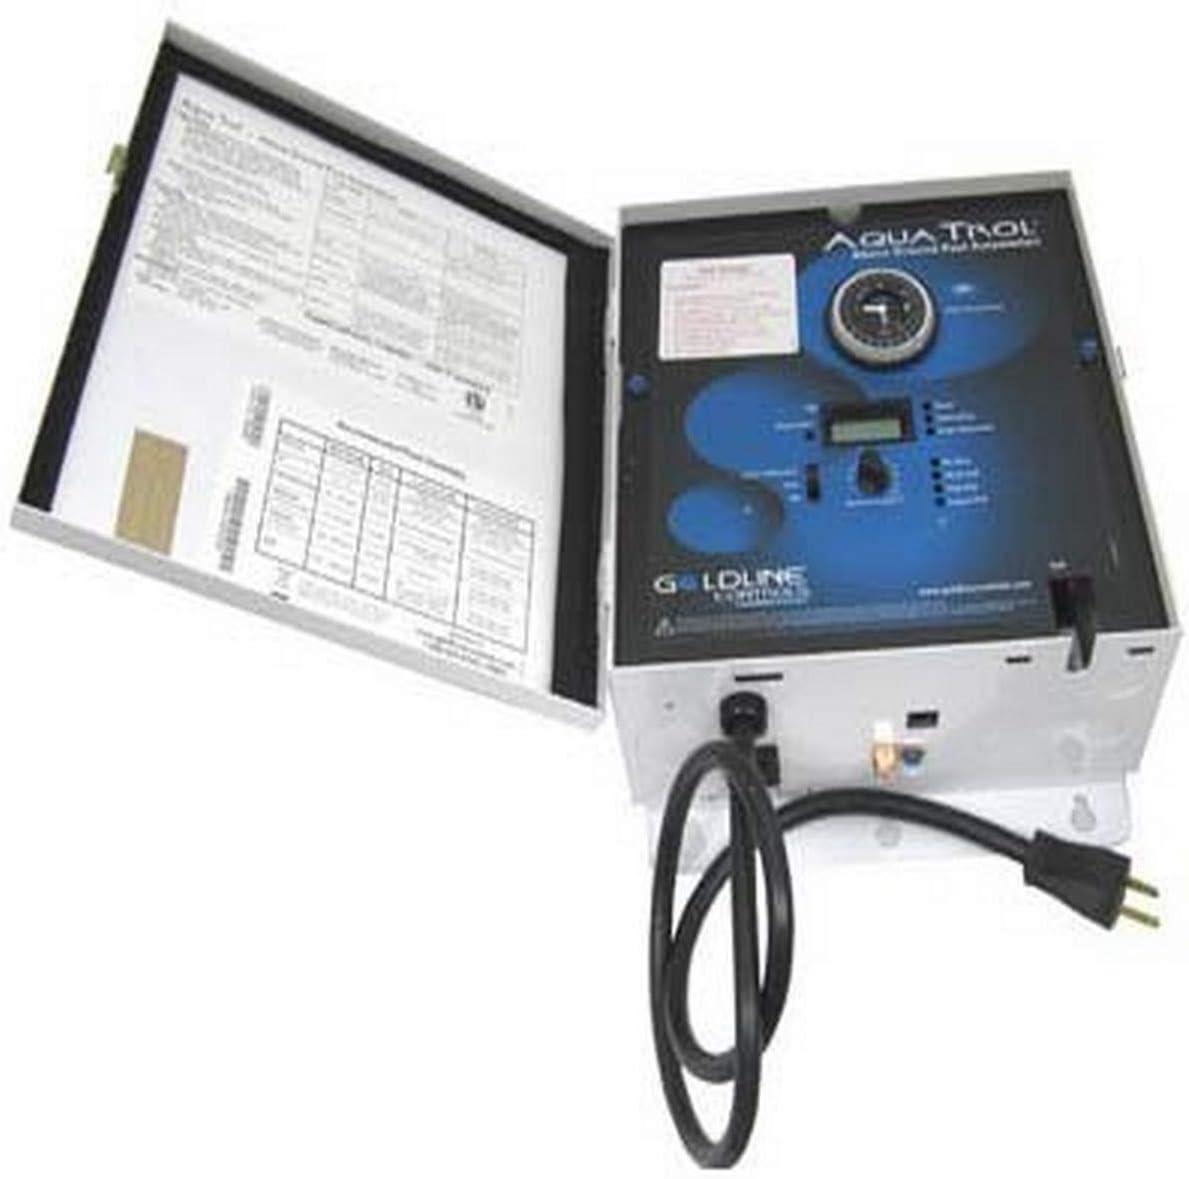 Hayward GLX-CTL-TR-RJ RJ Straight Blade Control Unit Replacement for Hayward Goldline Aqua Trol Salt Chlorine Generators